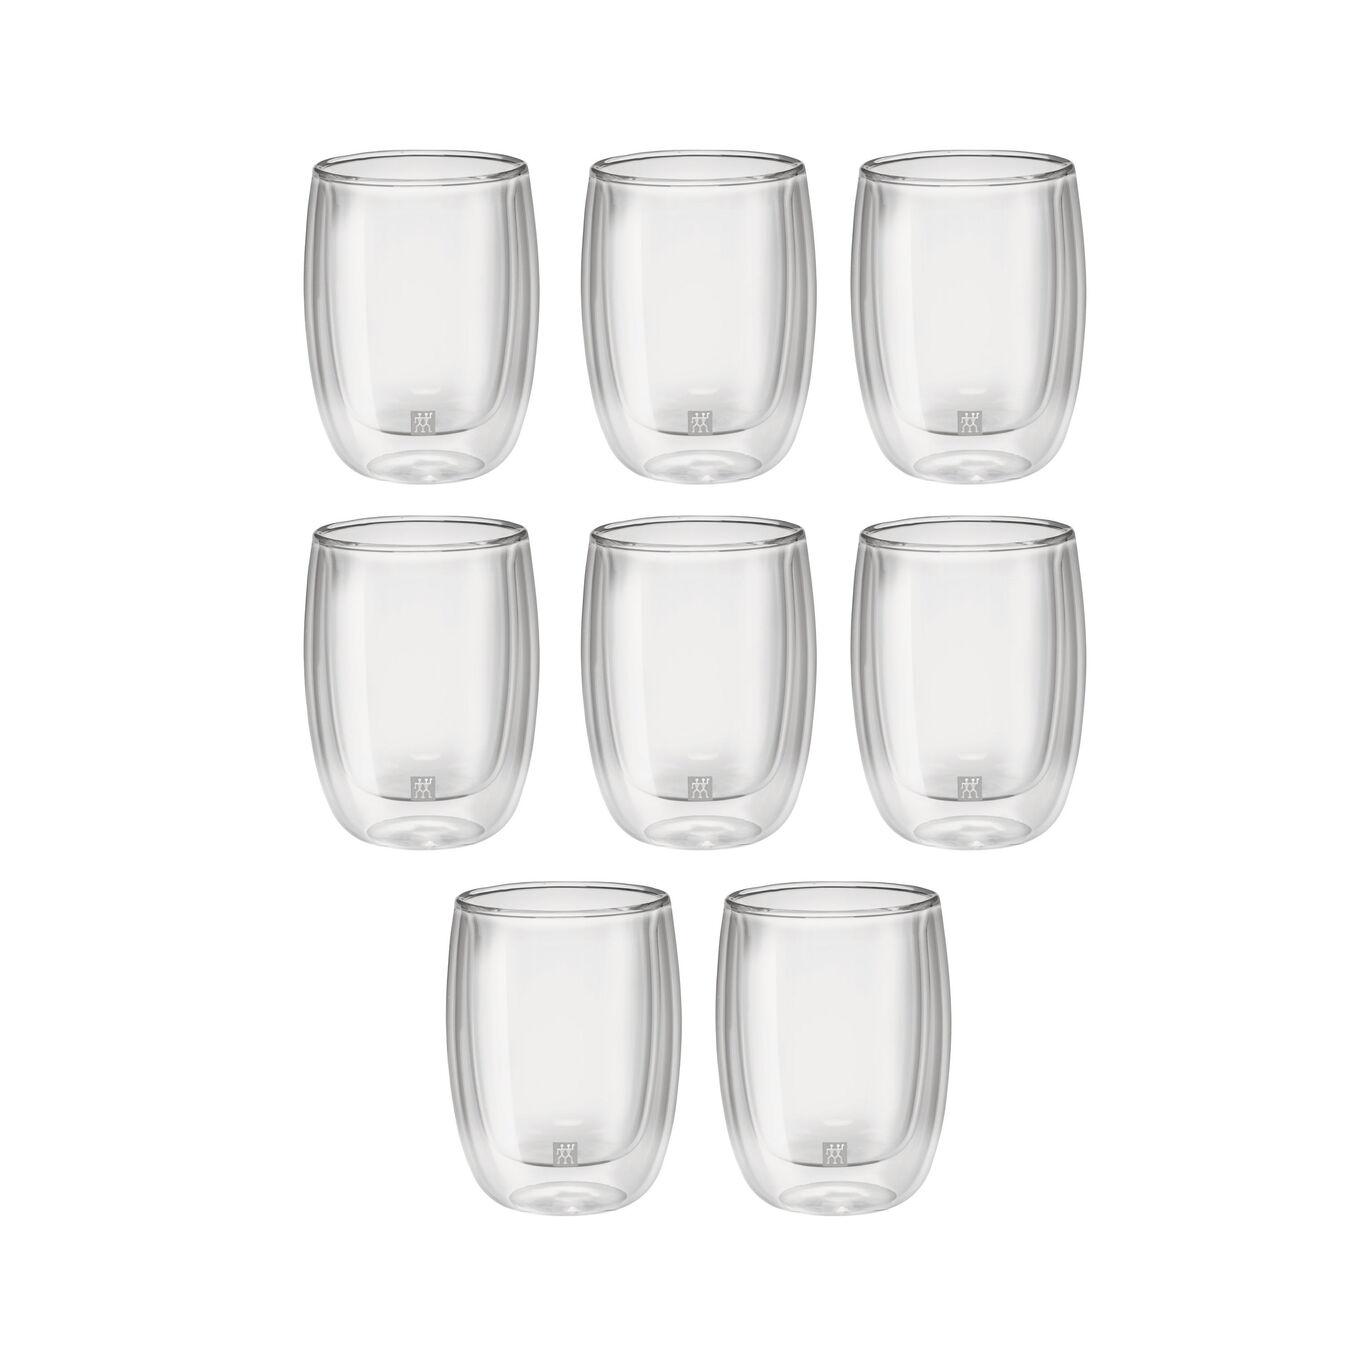 8 Piece Coffee glass set - Buy 6 Get 8,,large 1